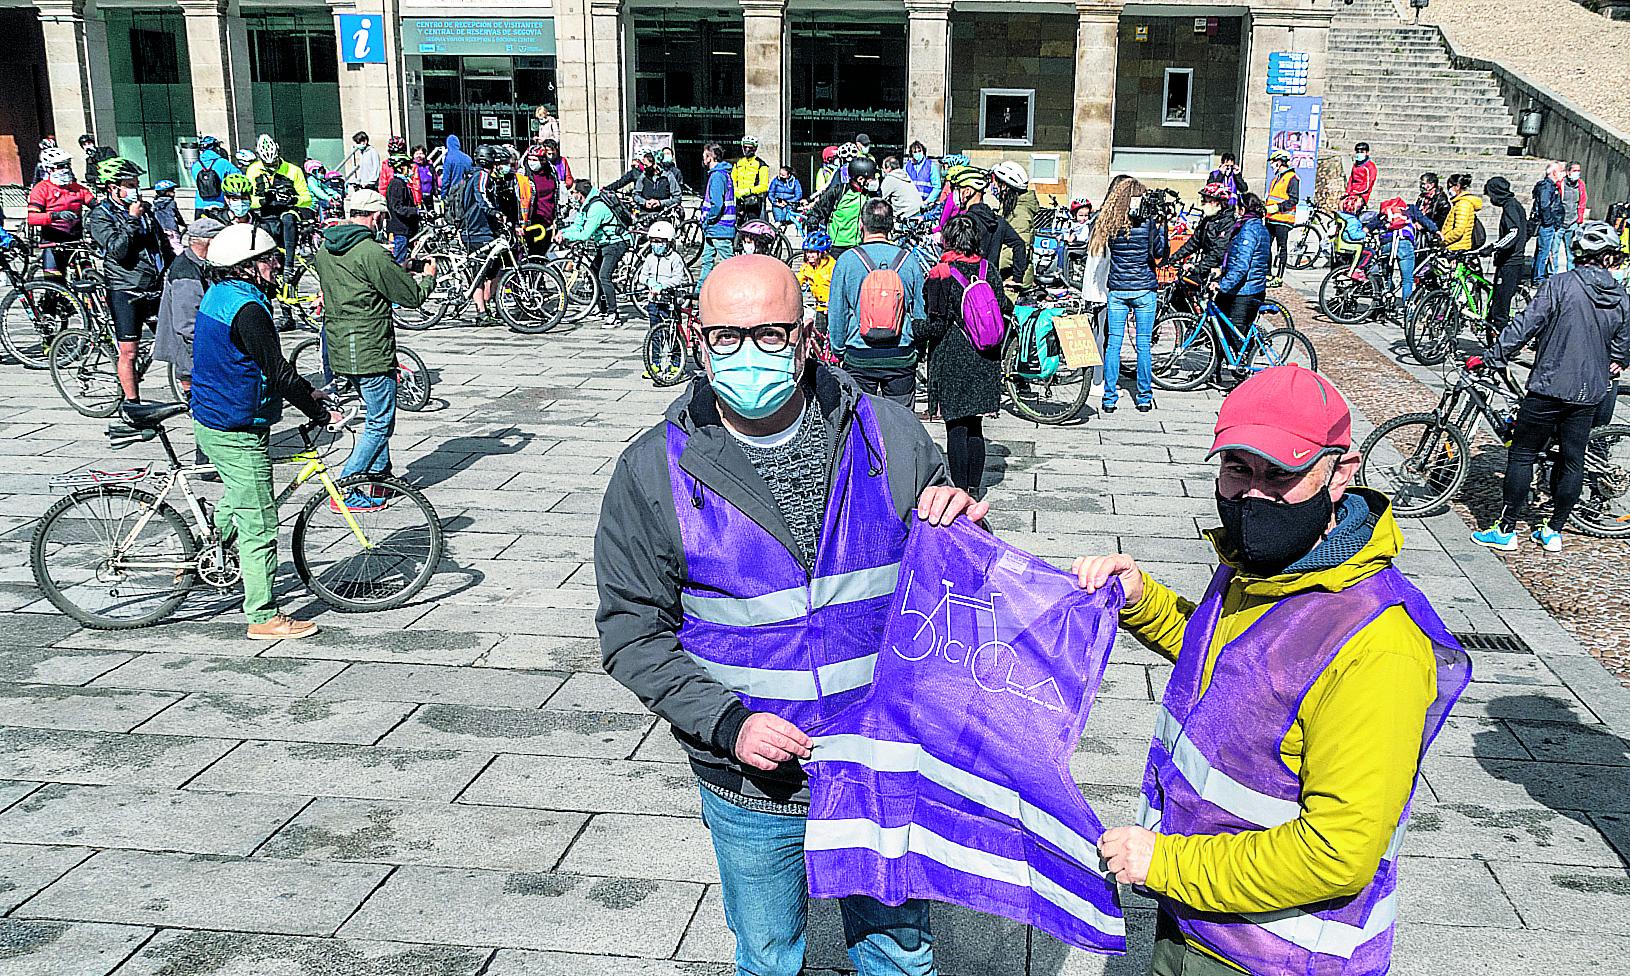 Bicicla pone a circular a más de un centenar de ciclistas